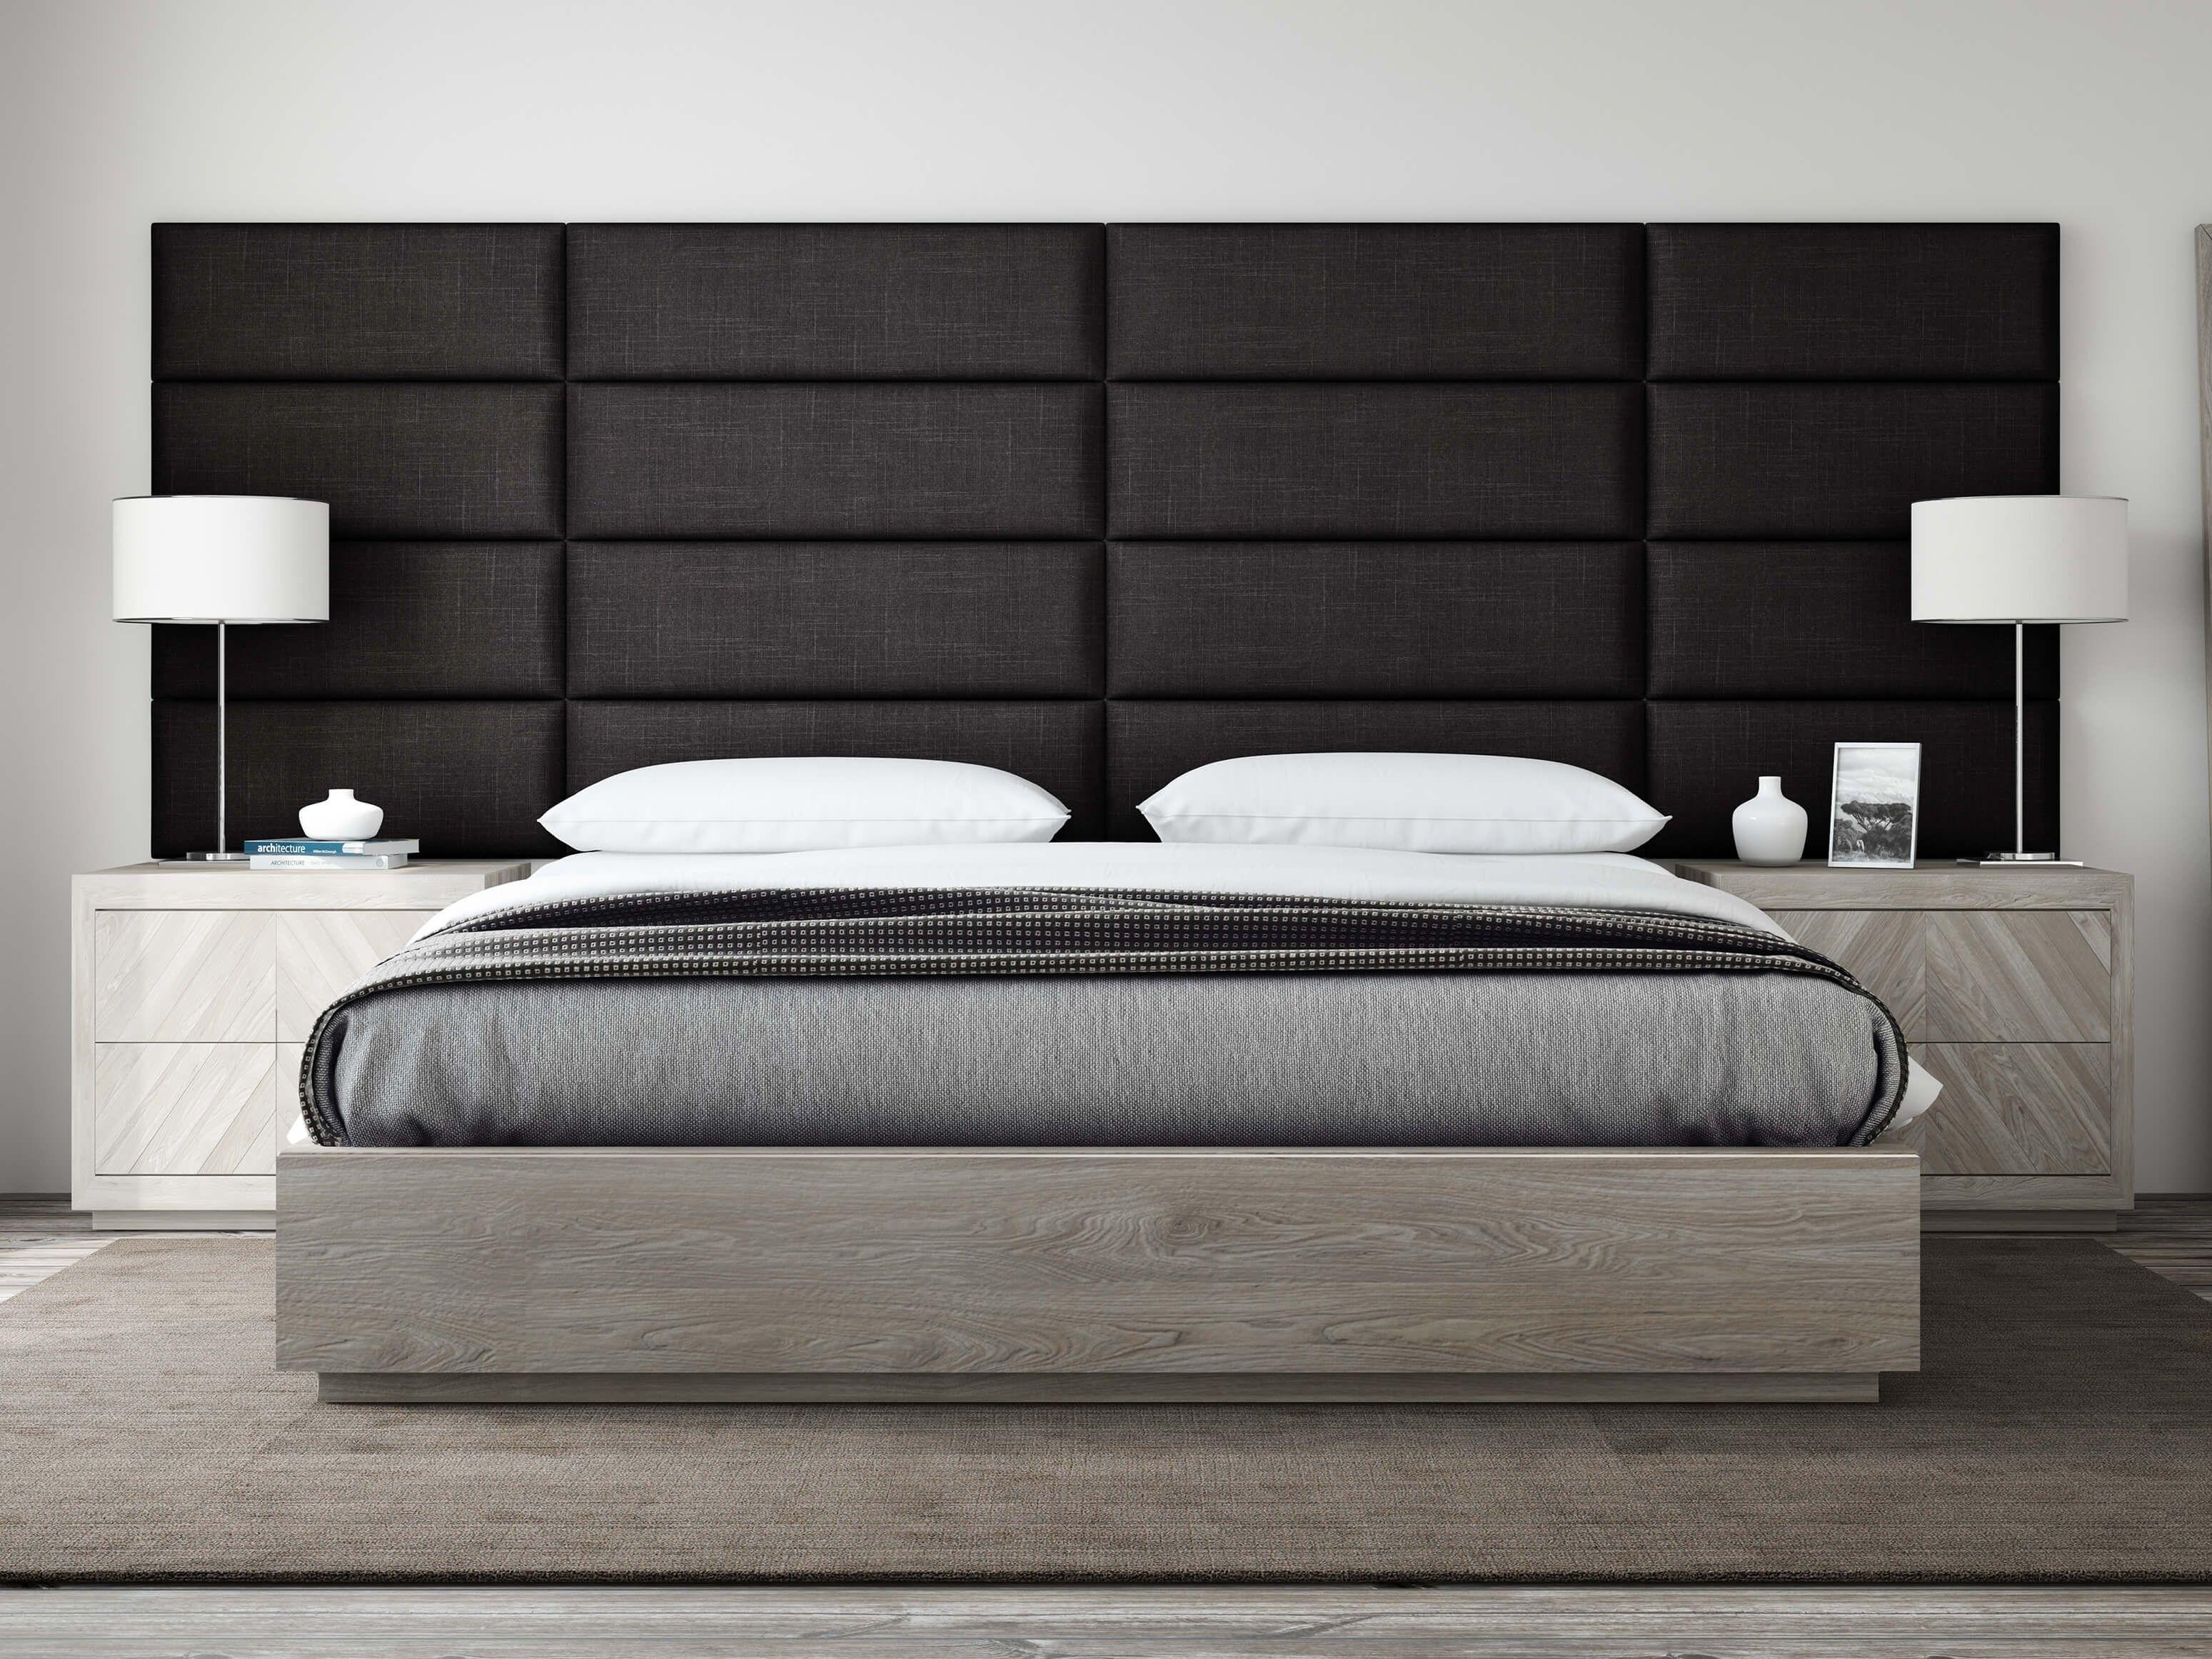 Vant S Most Popular Layouts In 2019 Bedroom Decor Home Decor